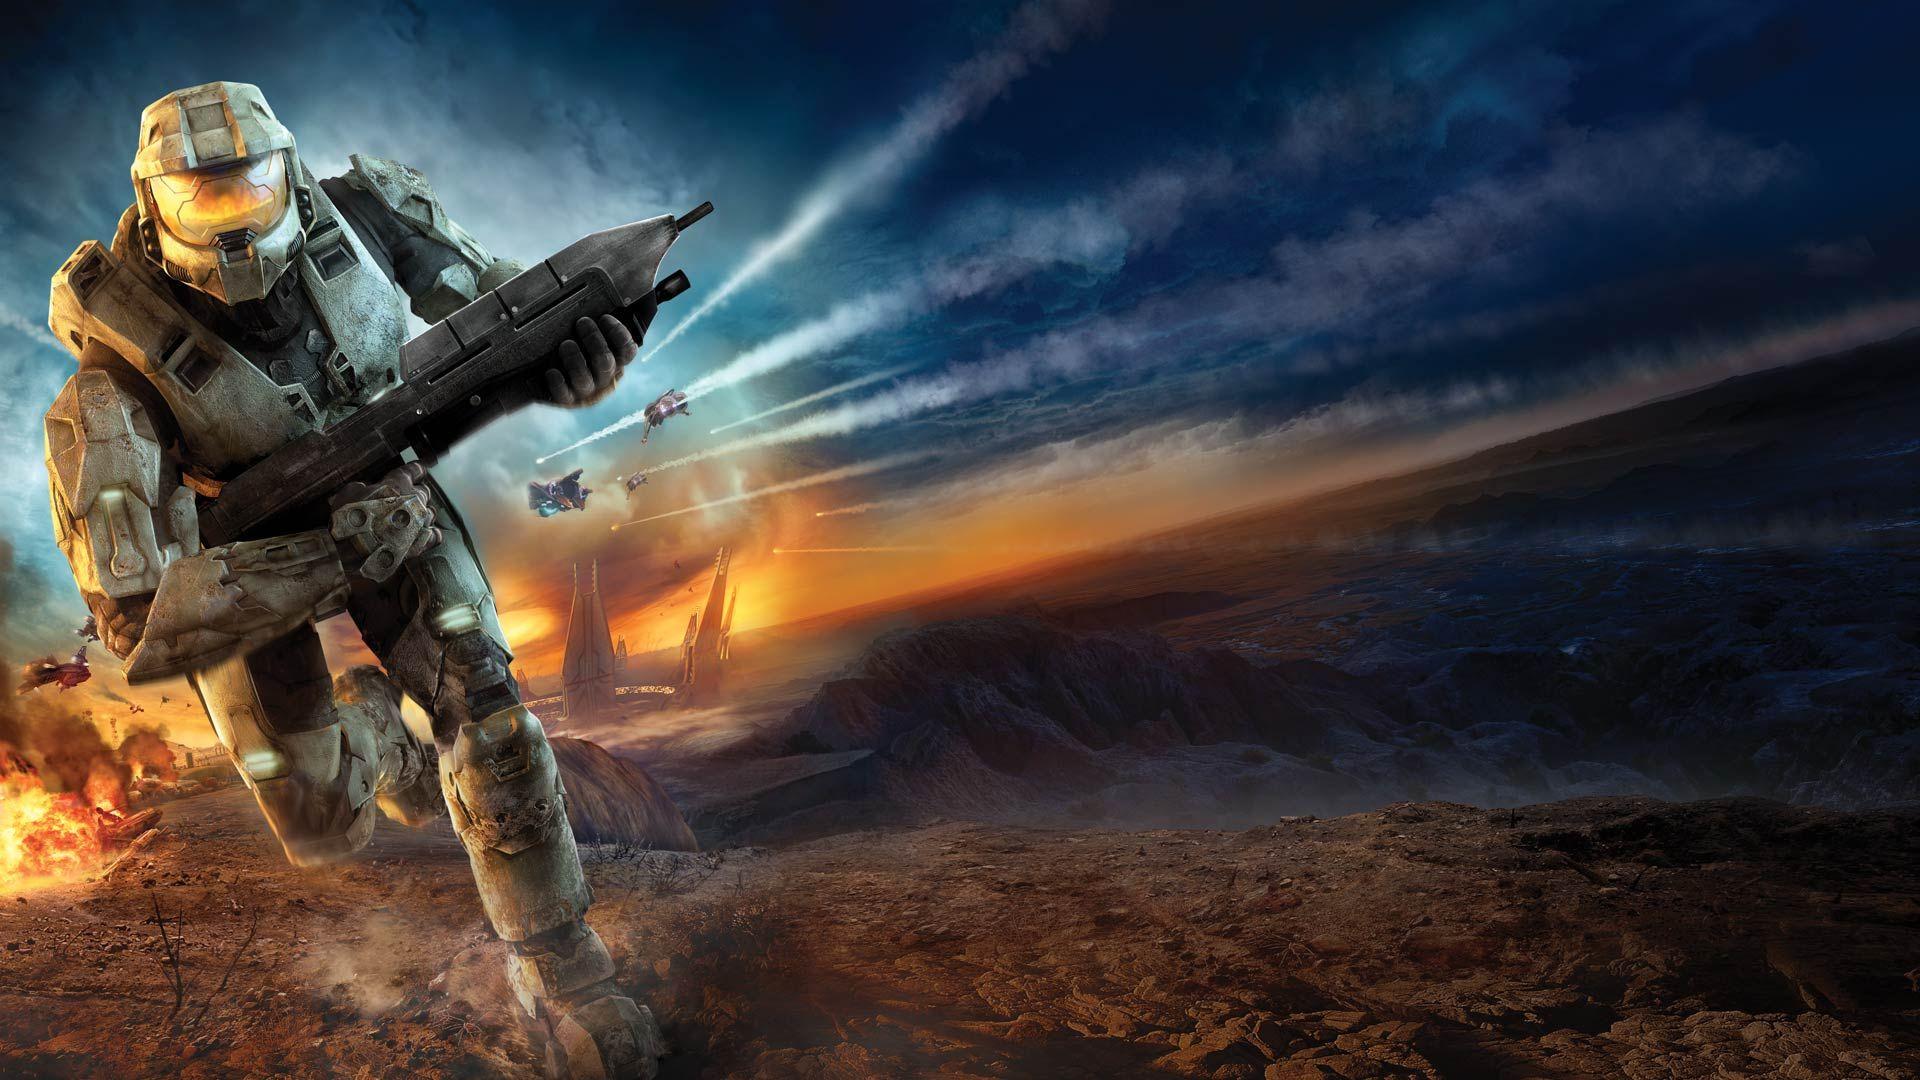 Choose The Best Halo Wallpaper